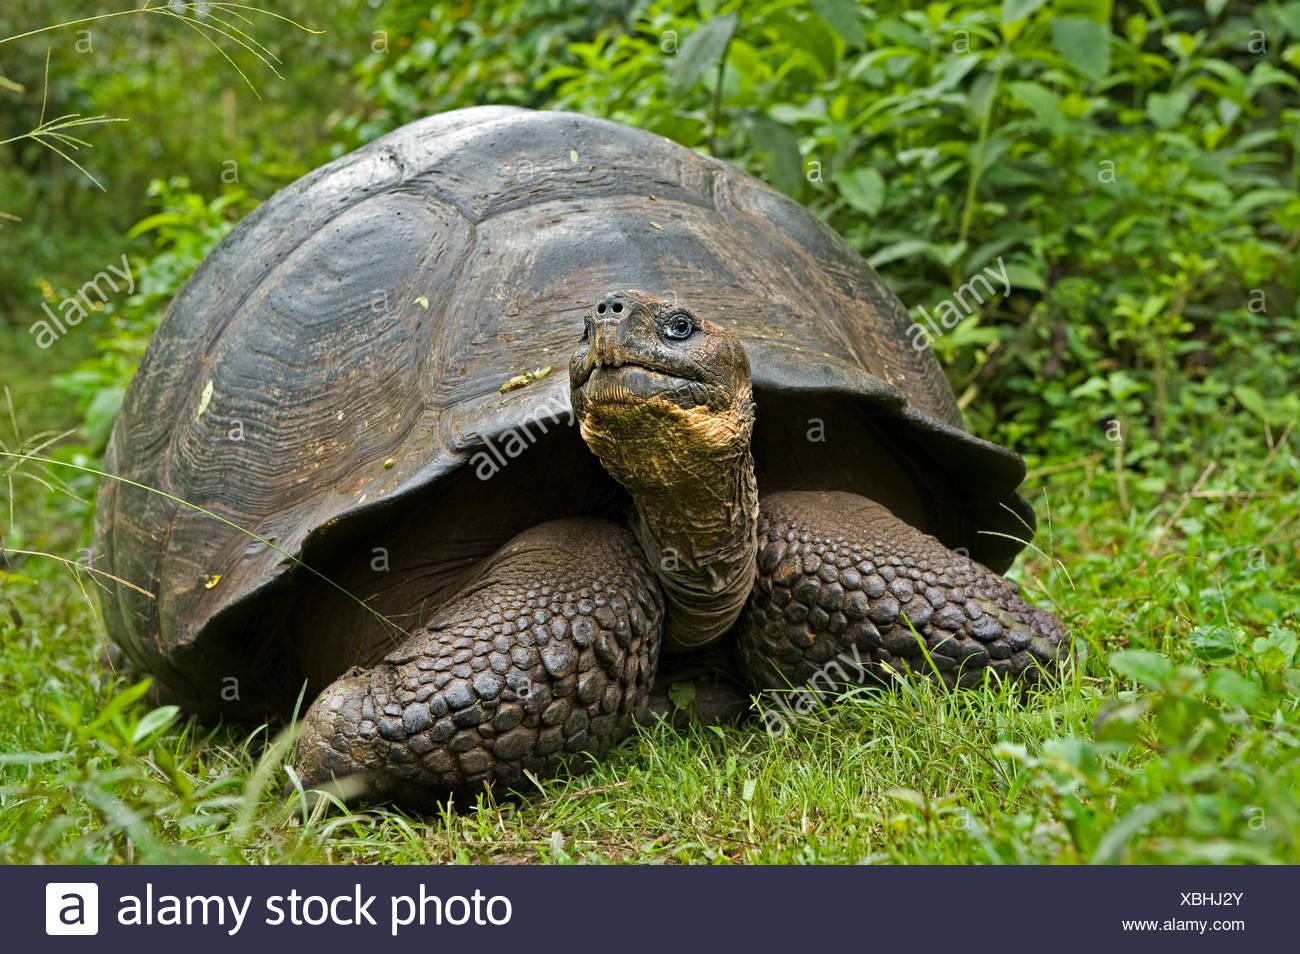 Galapagos giant tortoise (Geochelone elephantopus / nigra) adult in habitat, Santa Cruz, Galapagos. Endangered species. - Stock Image